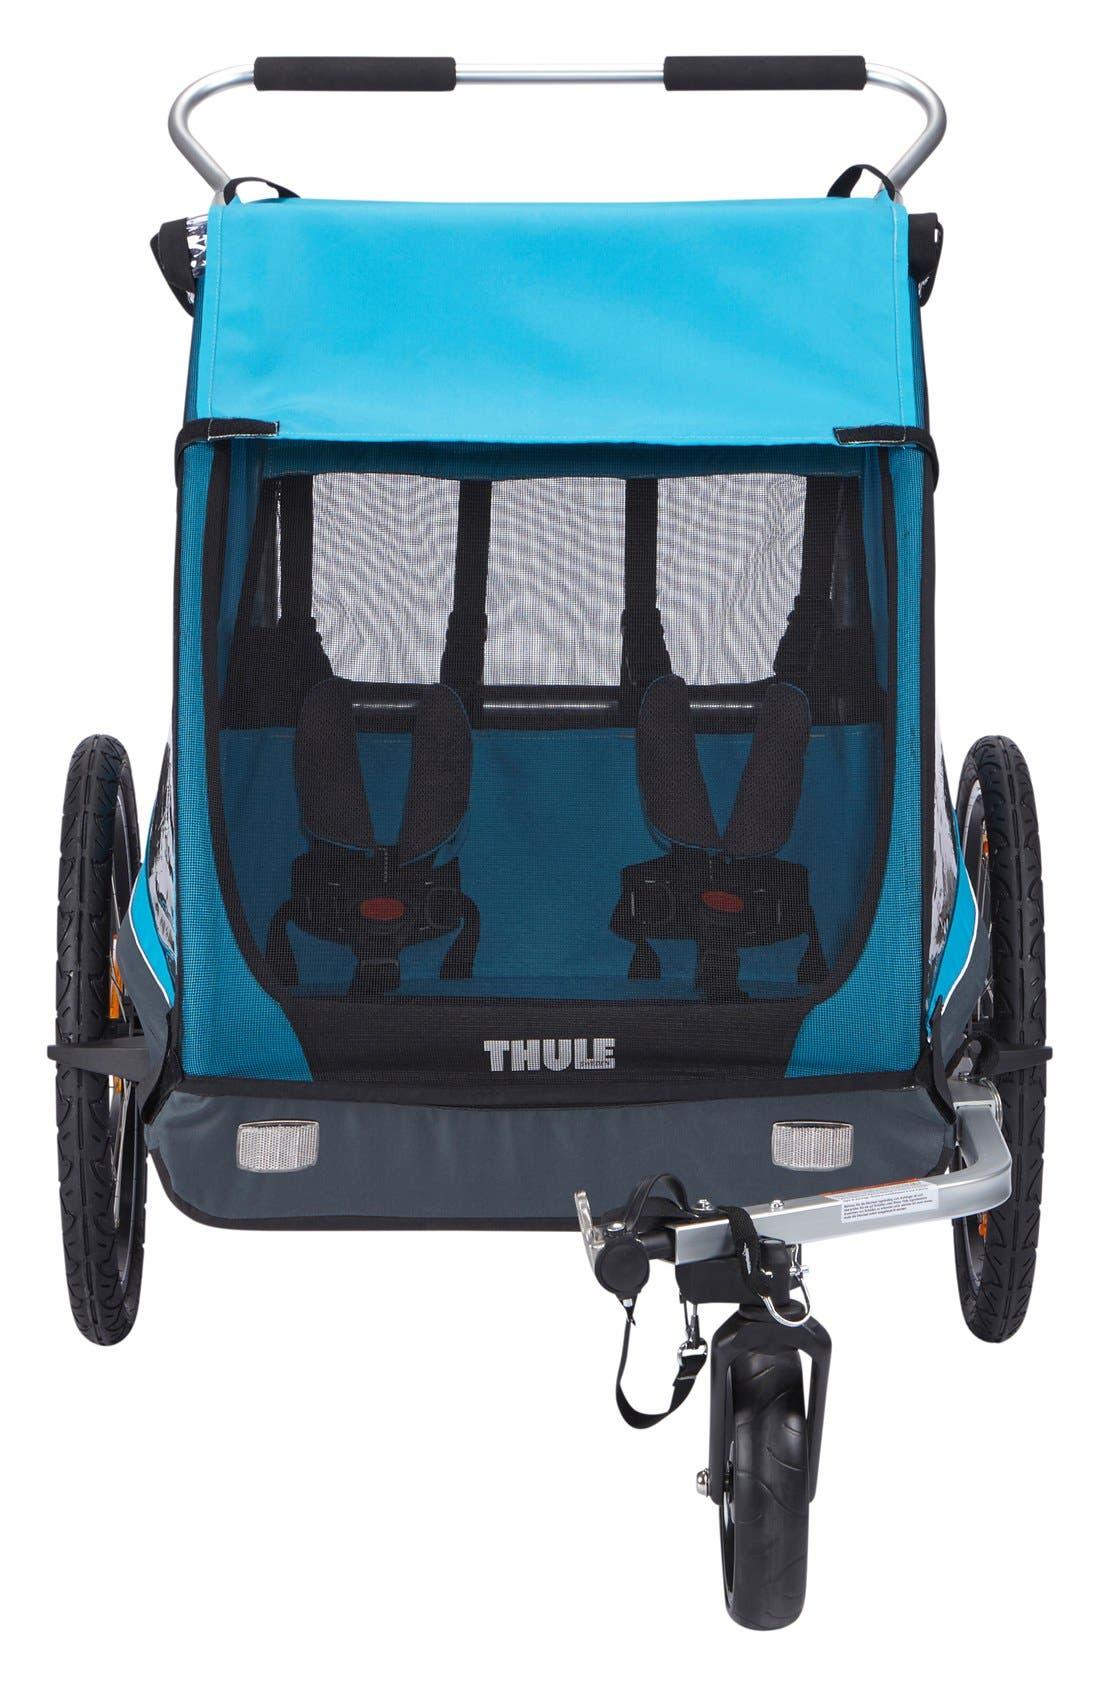 Thule Infant Thule Coaster Xt Double Seat Bike Trailer, Size One Size - Blue